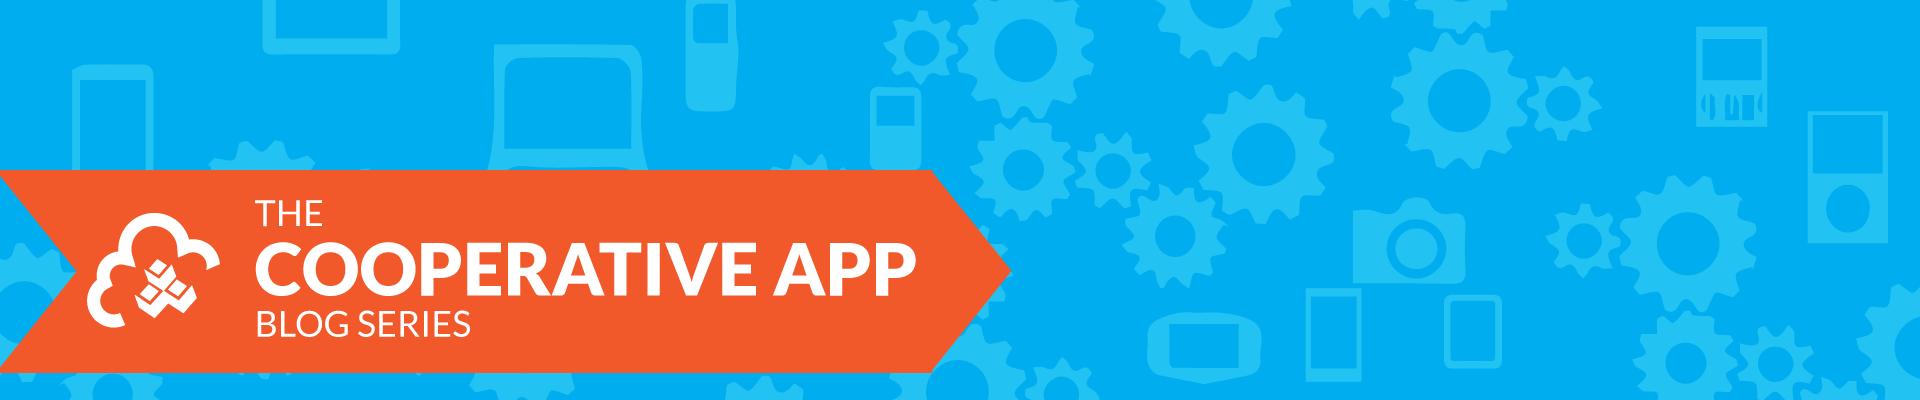 cooperative-app-series-banner